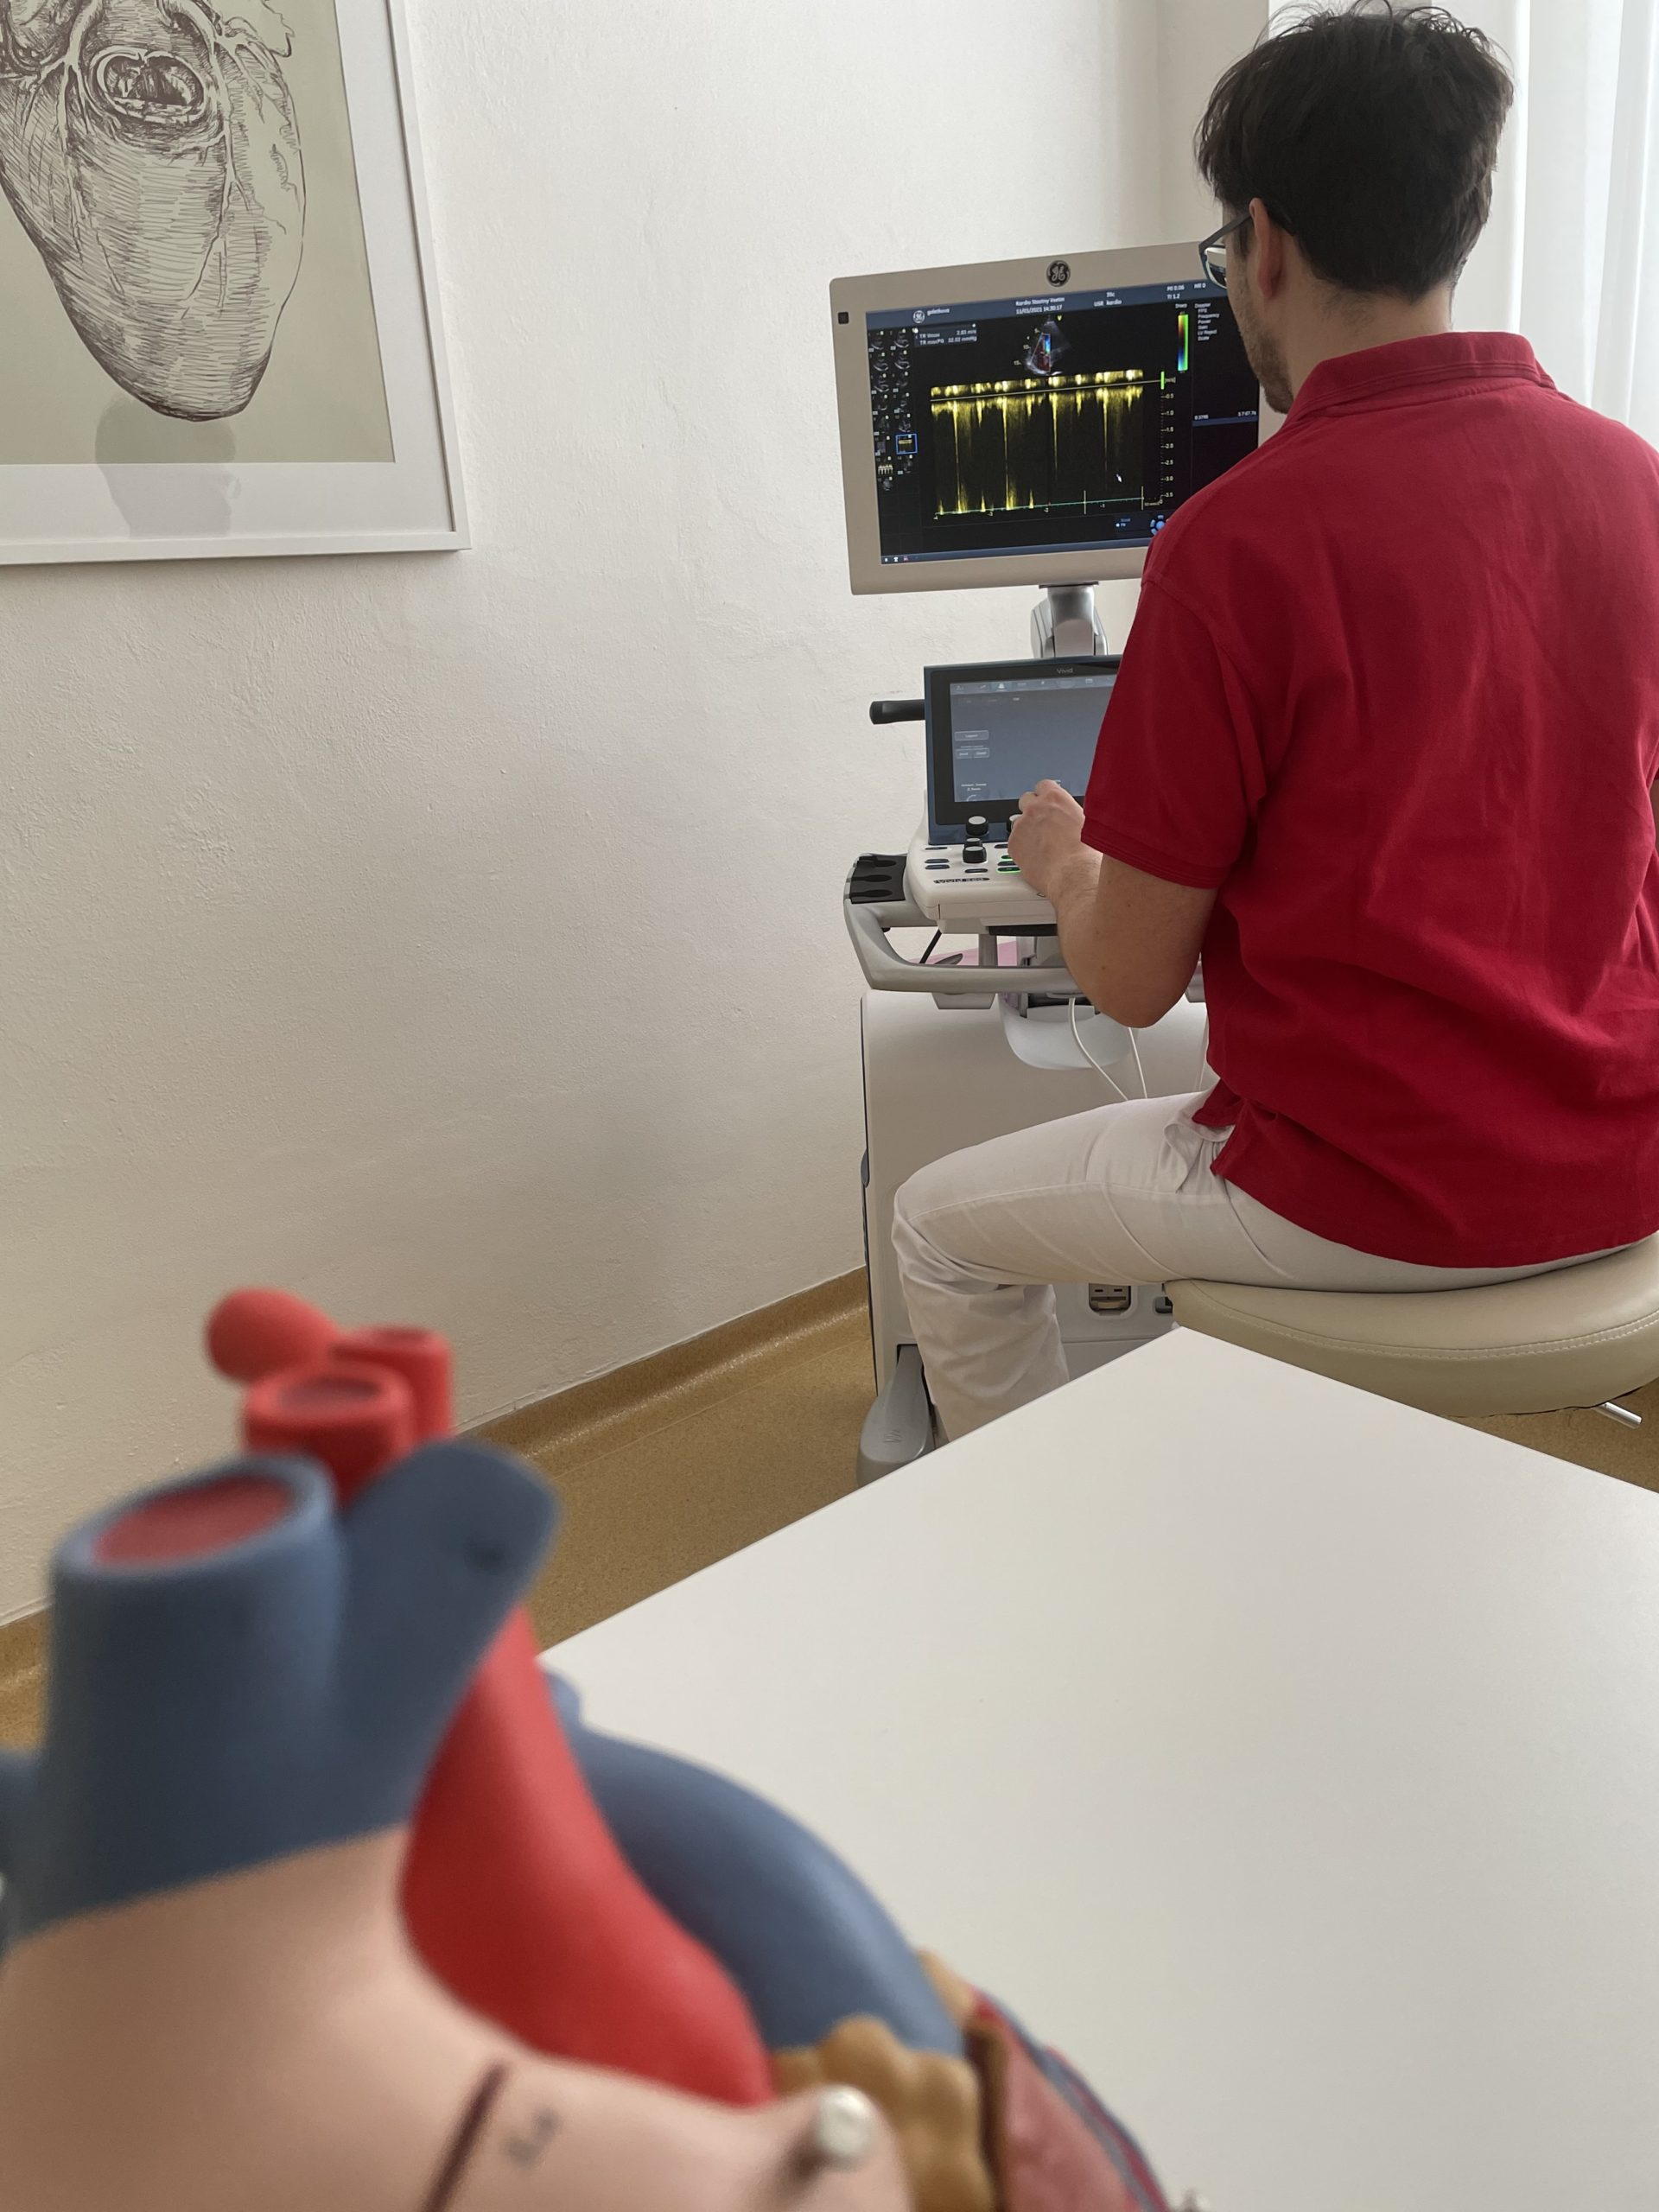 Kardiologie Vsetin sro Sono